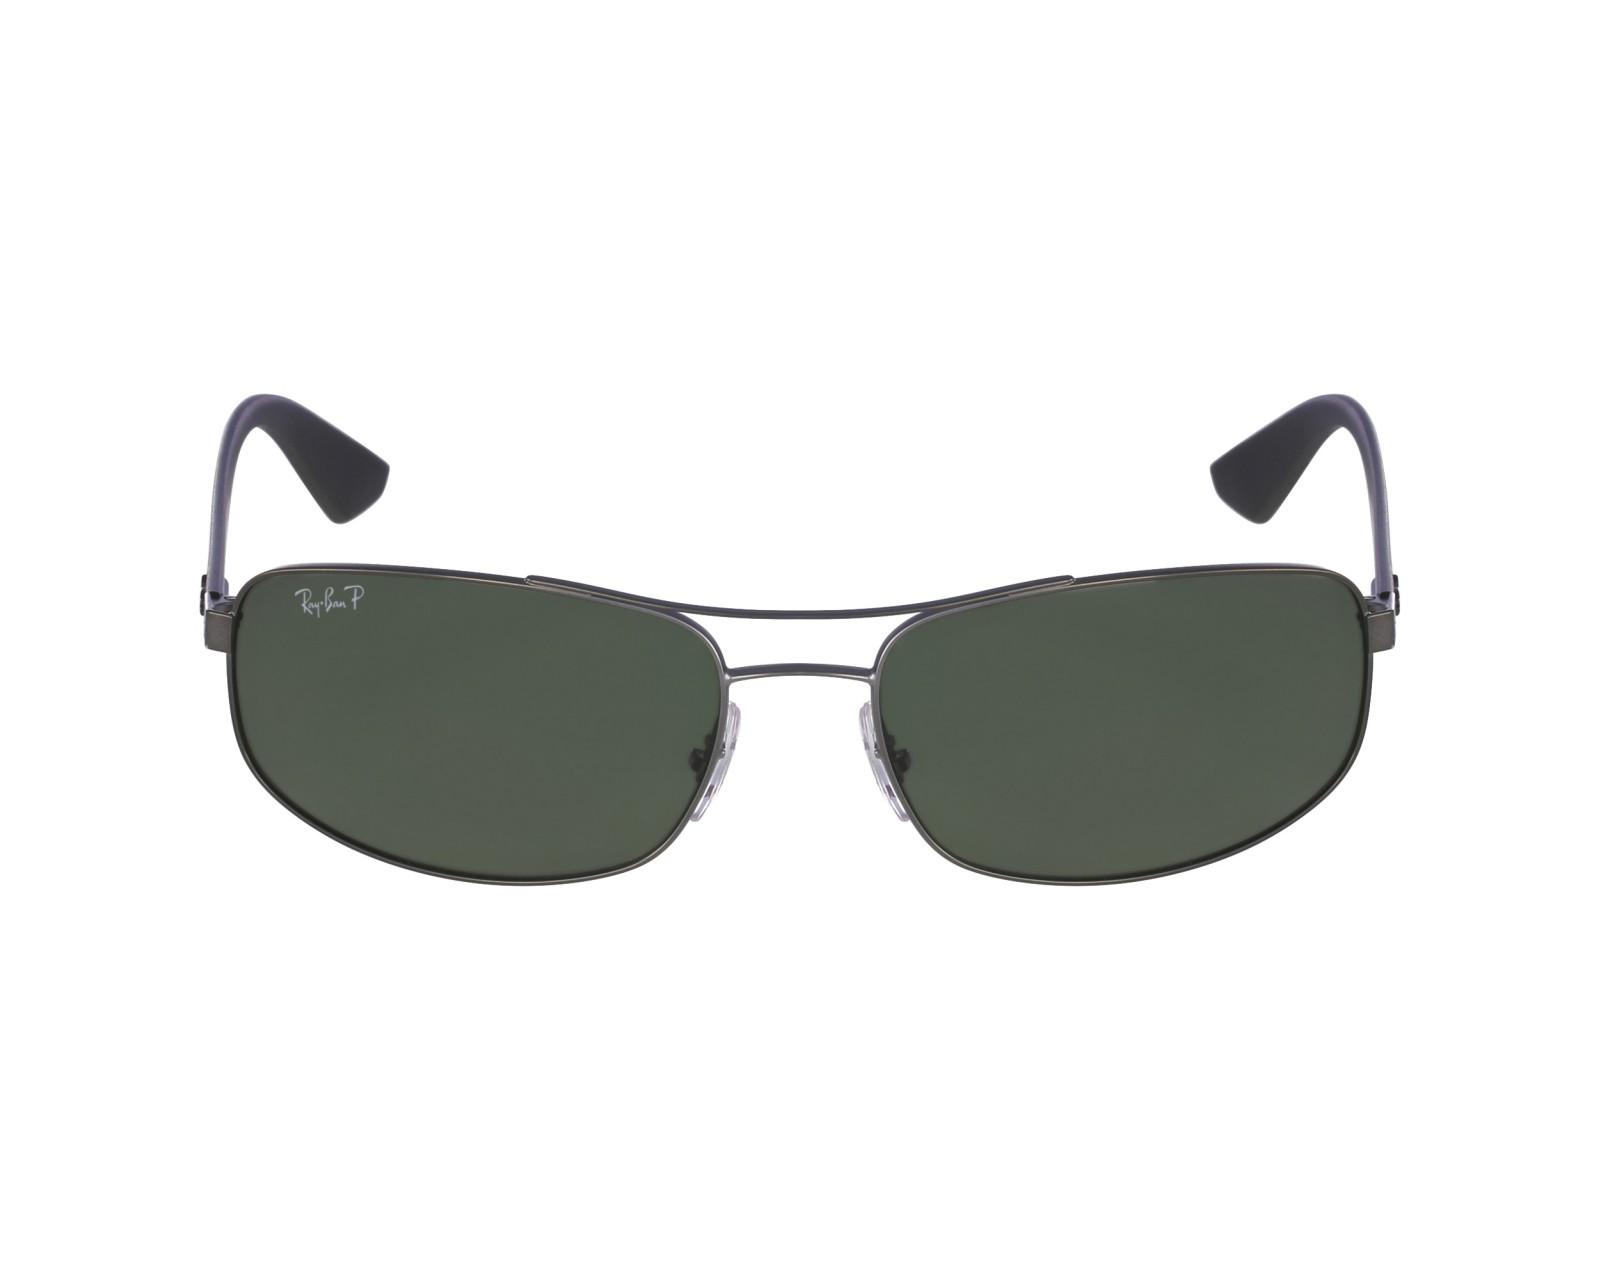 7ddad7834b thumbnail Sunglasses Ray-Ban RB-3527 029 9A - Gun Black profile view